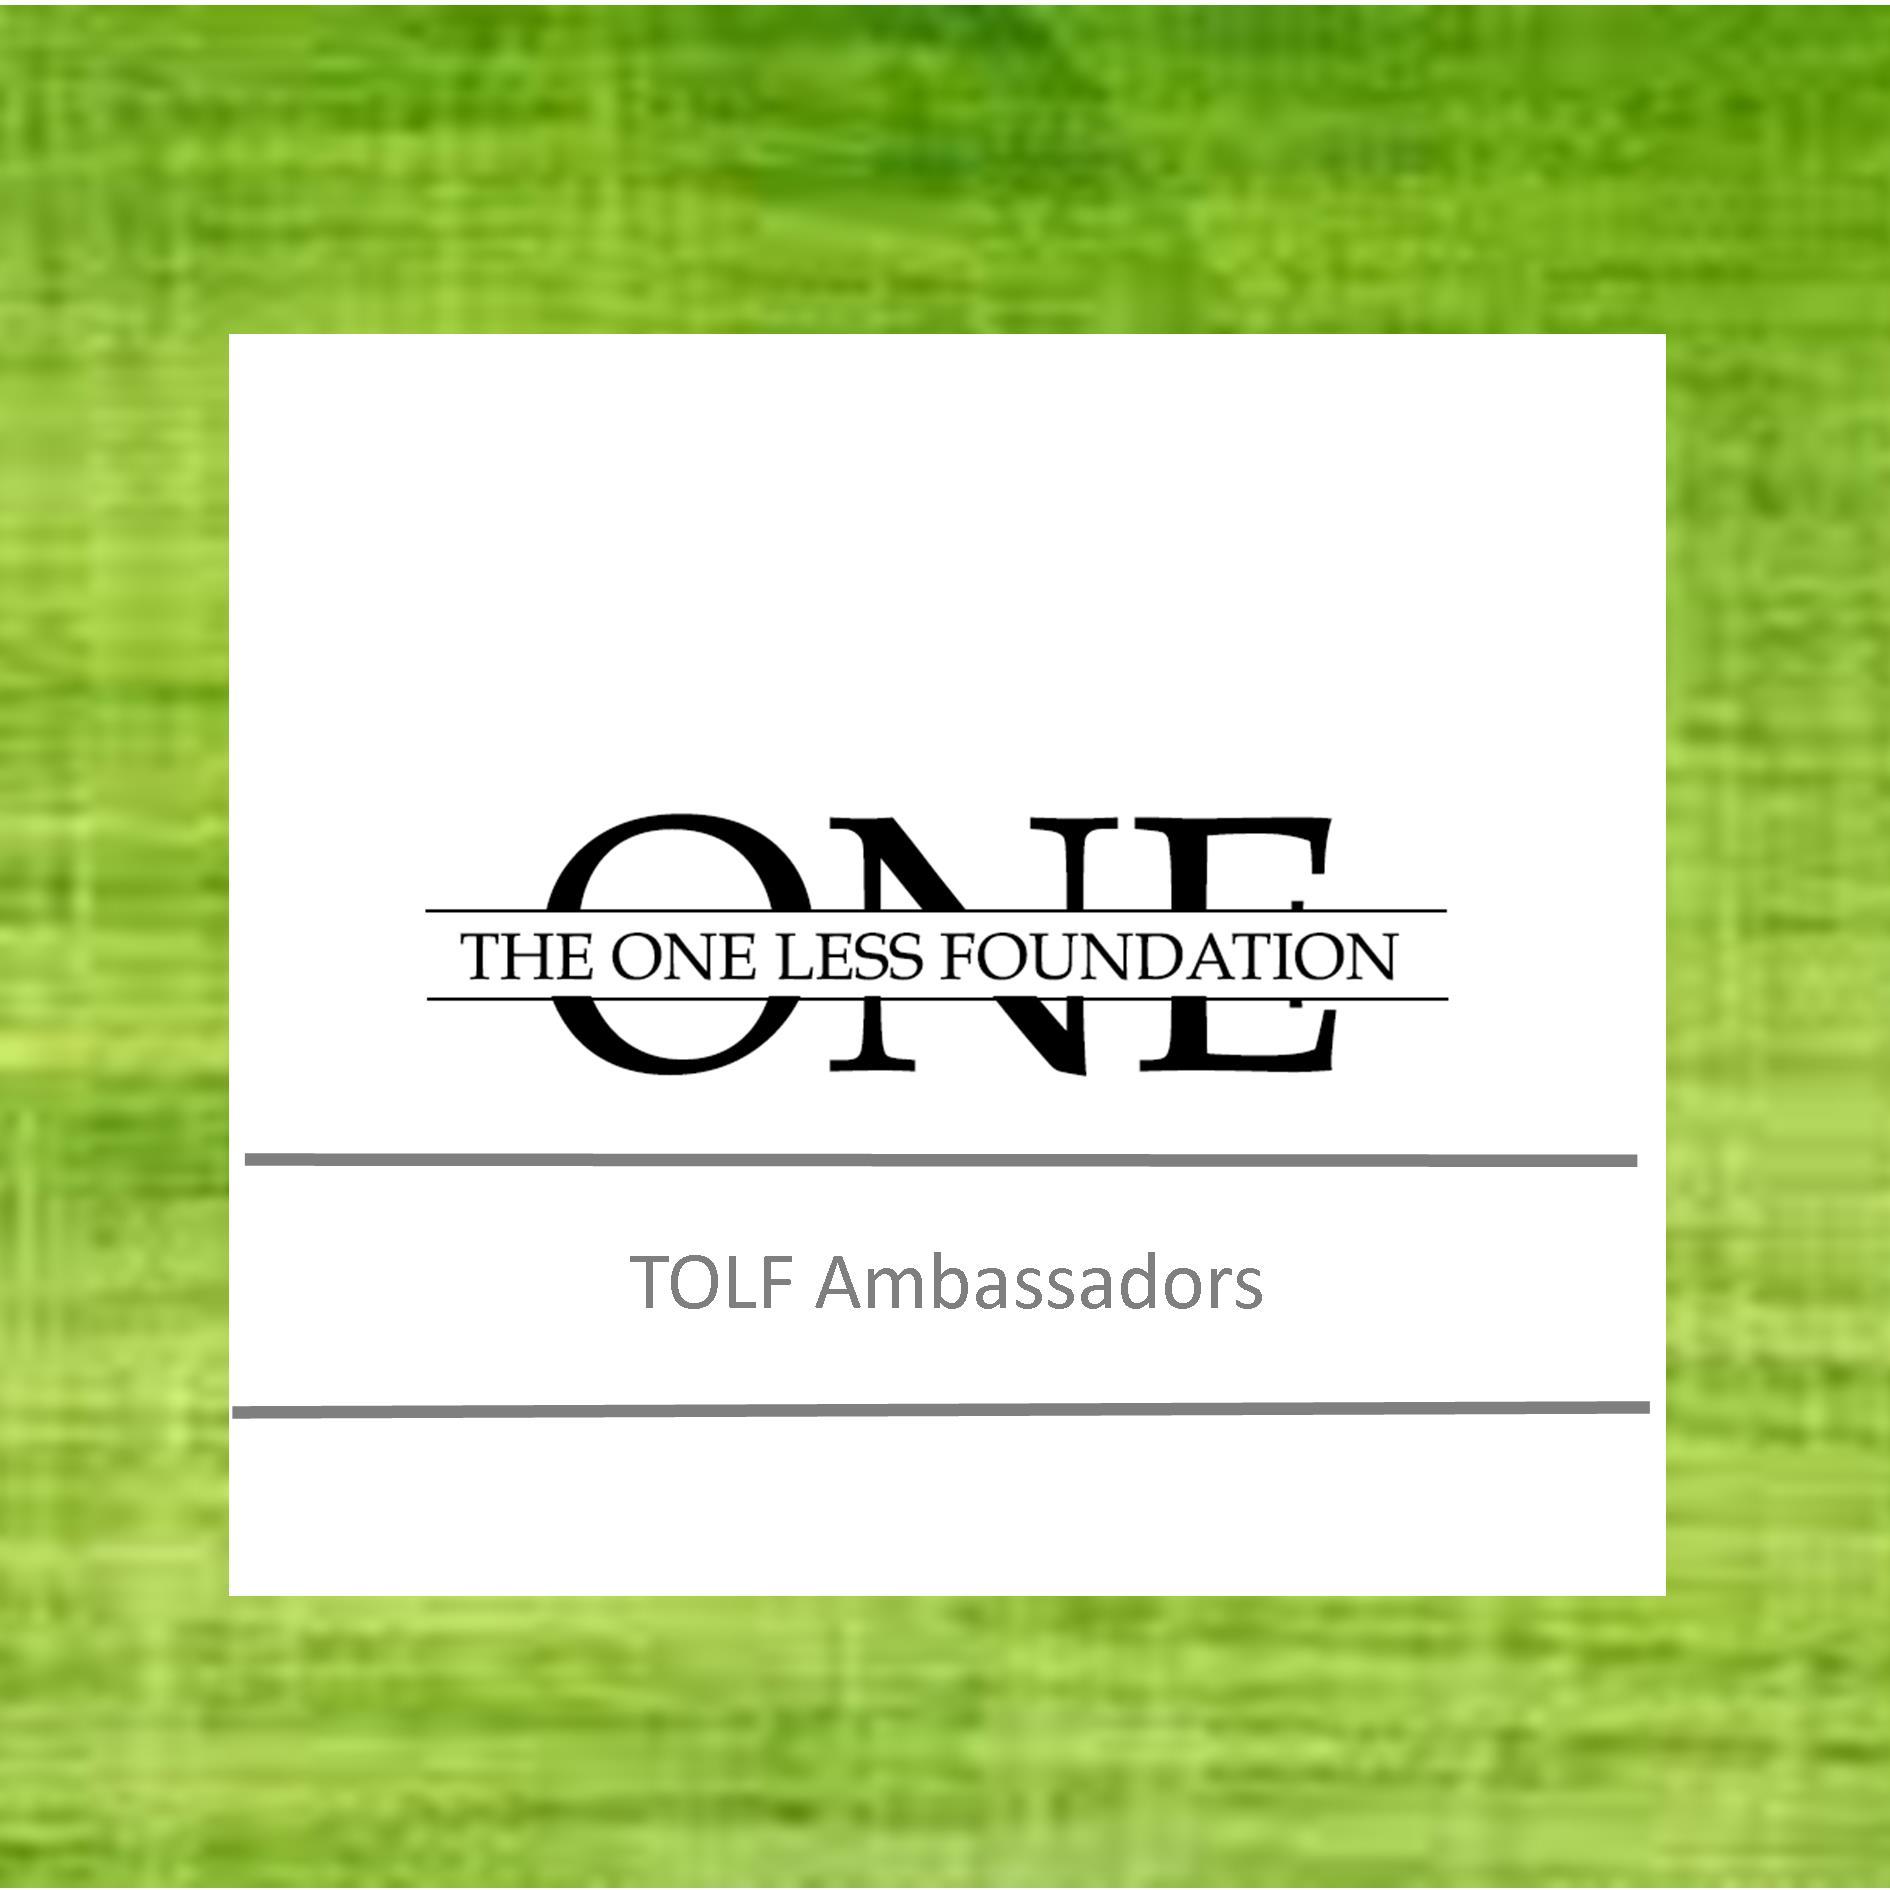 TOLF Ambassadors.jpg